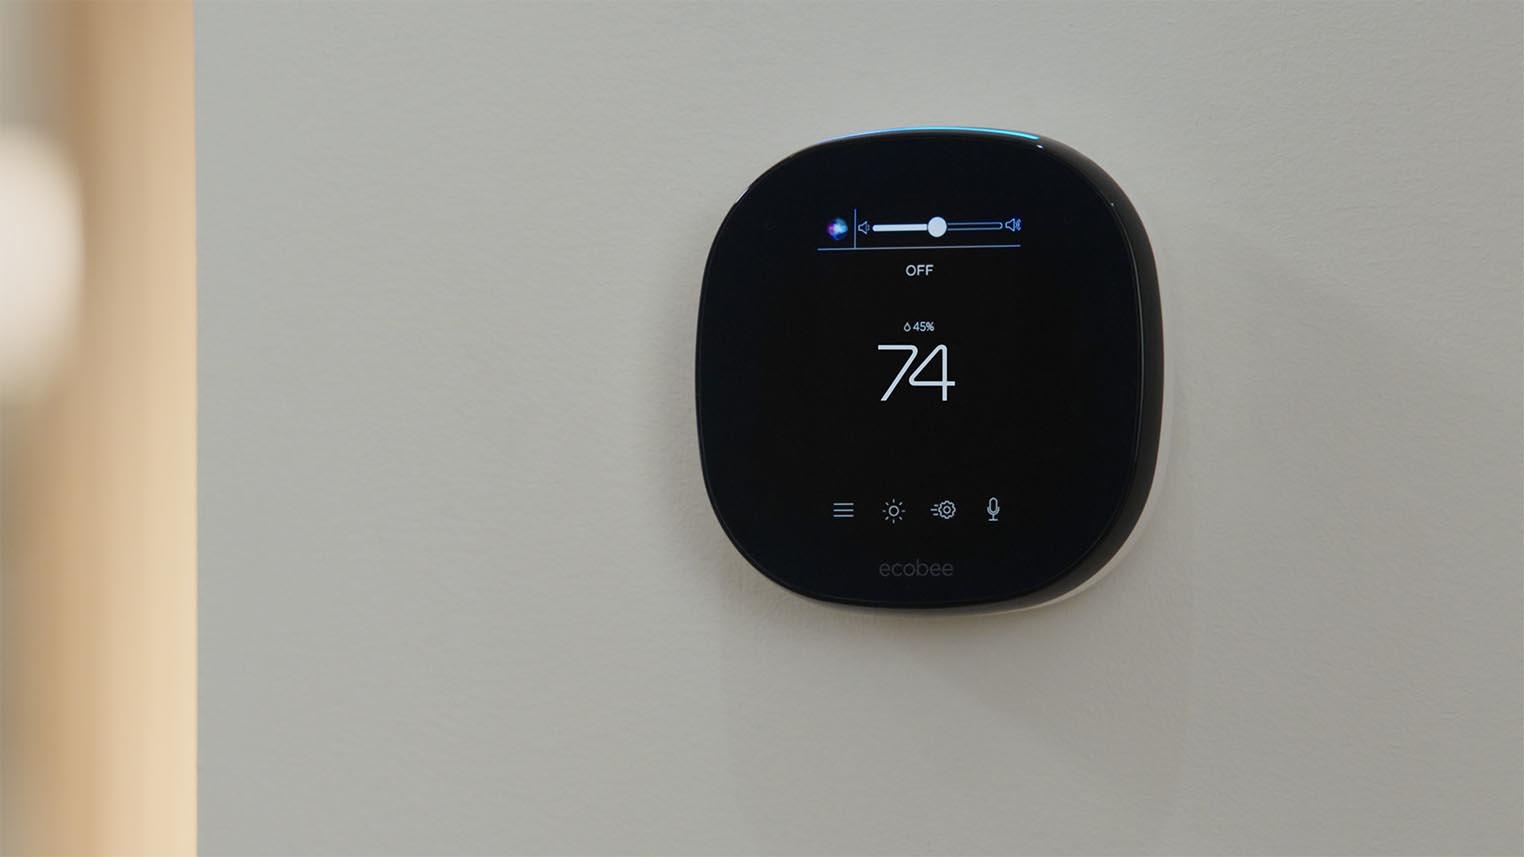 Siri ecobee SmartThermostat